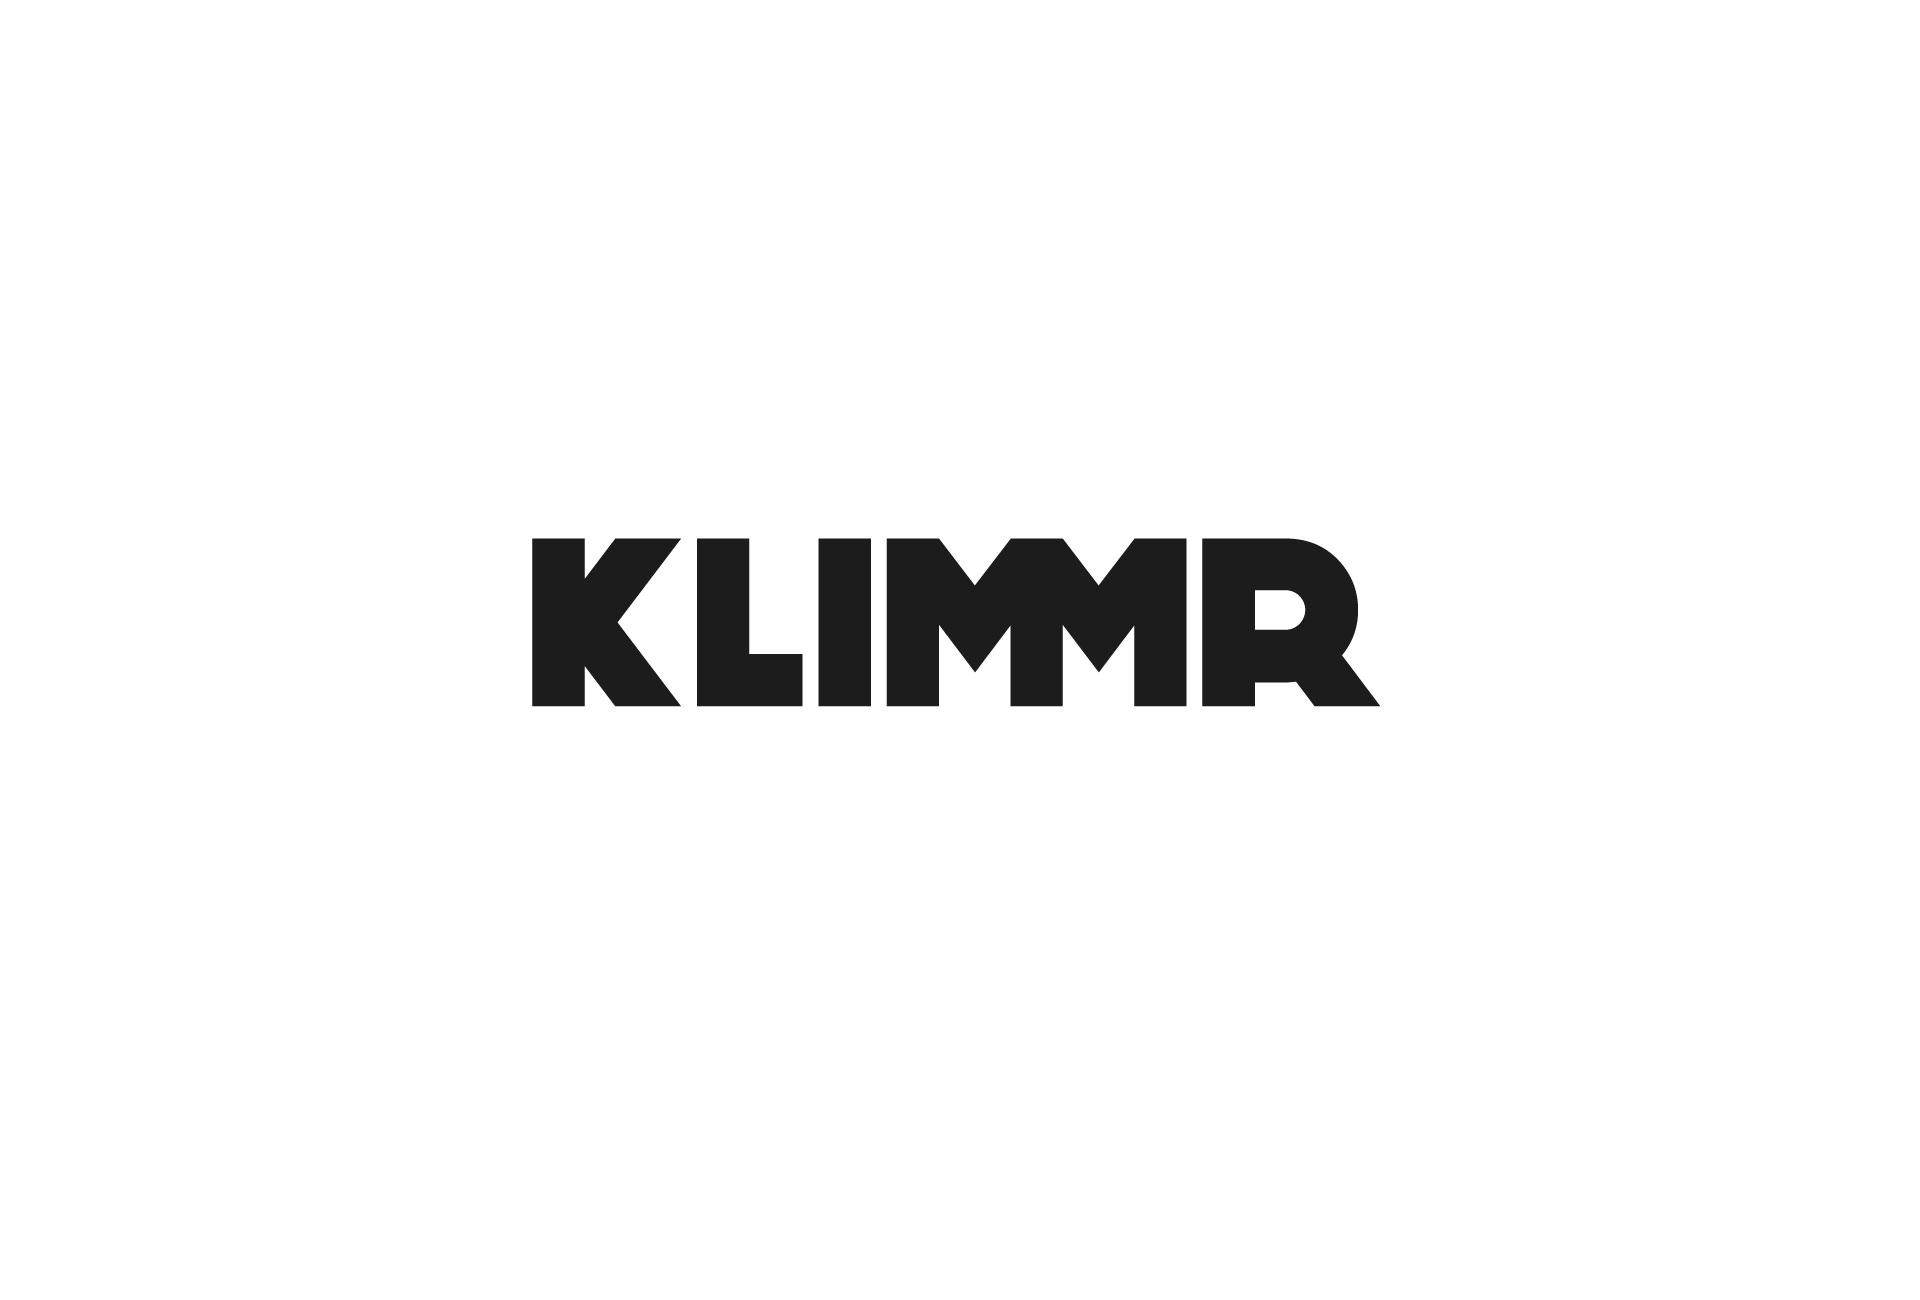 KLIMMR Huisstijl logo zwart